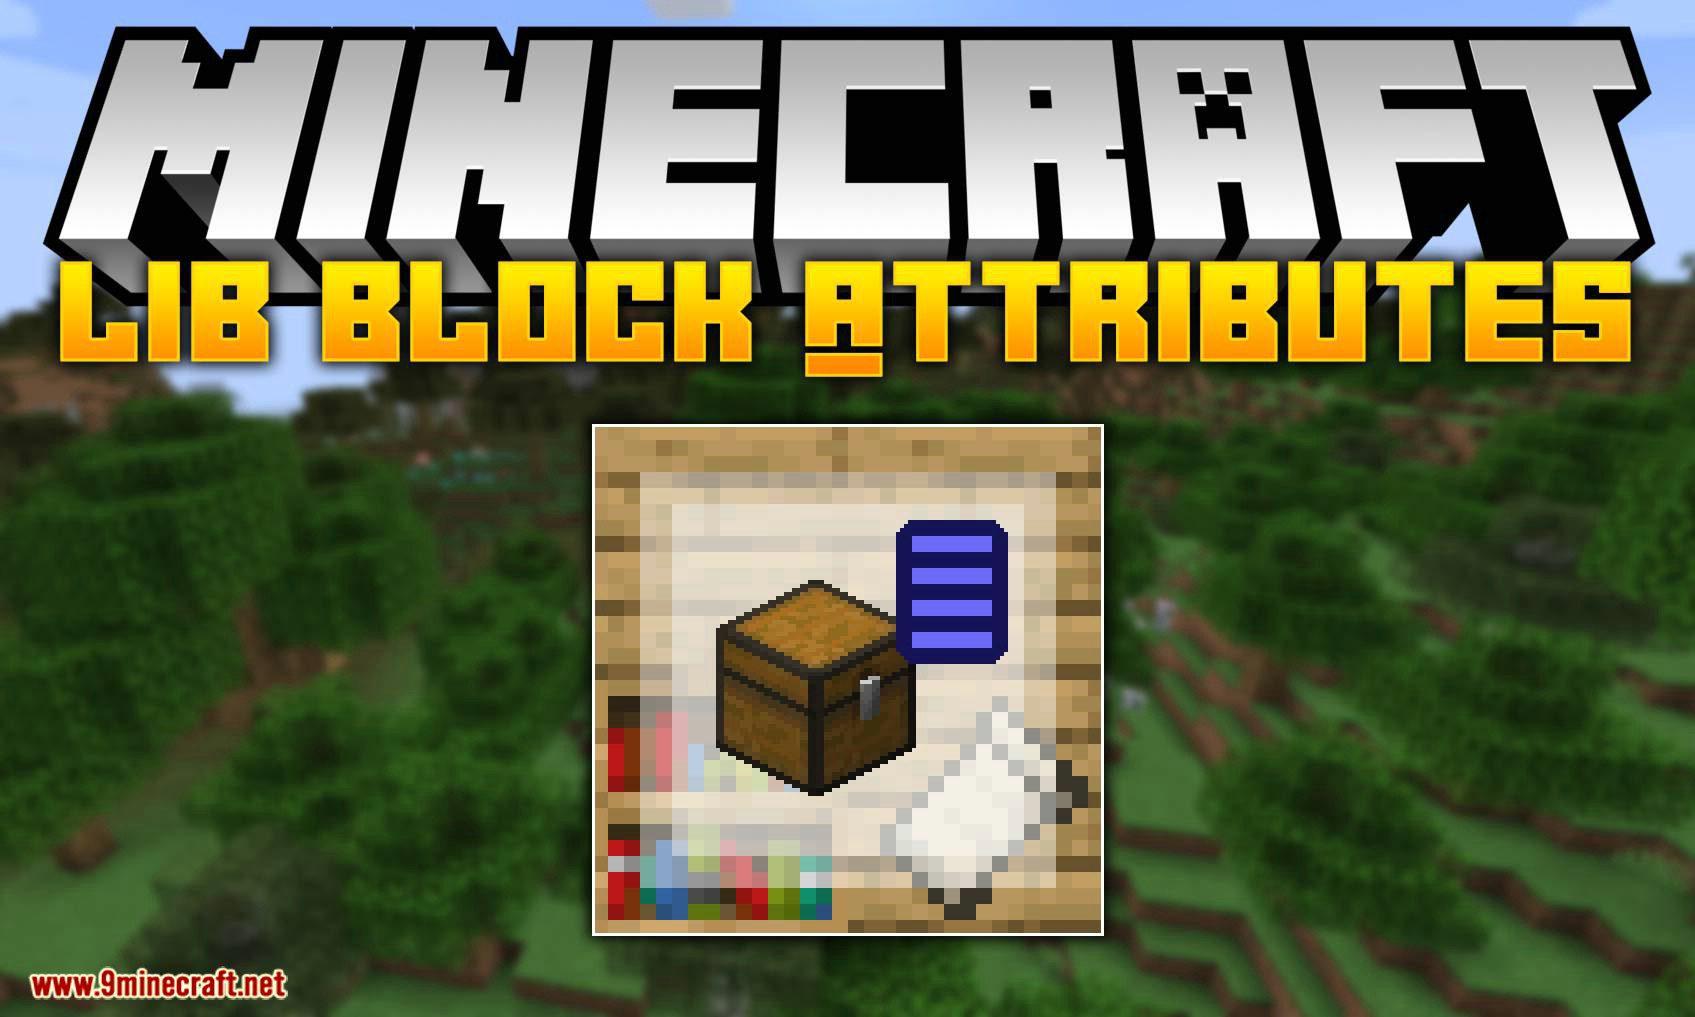 Lib Block Attributes mod for minecraft logo